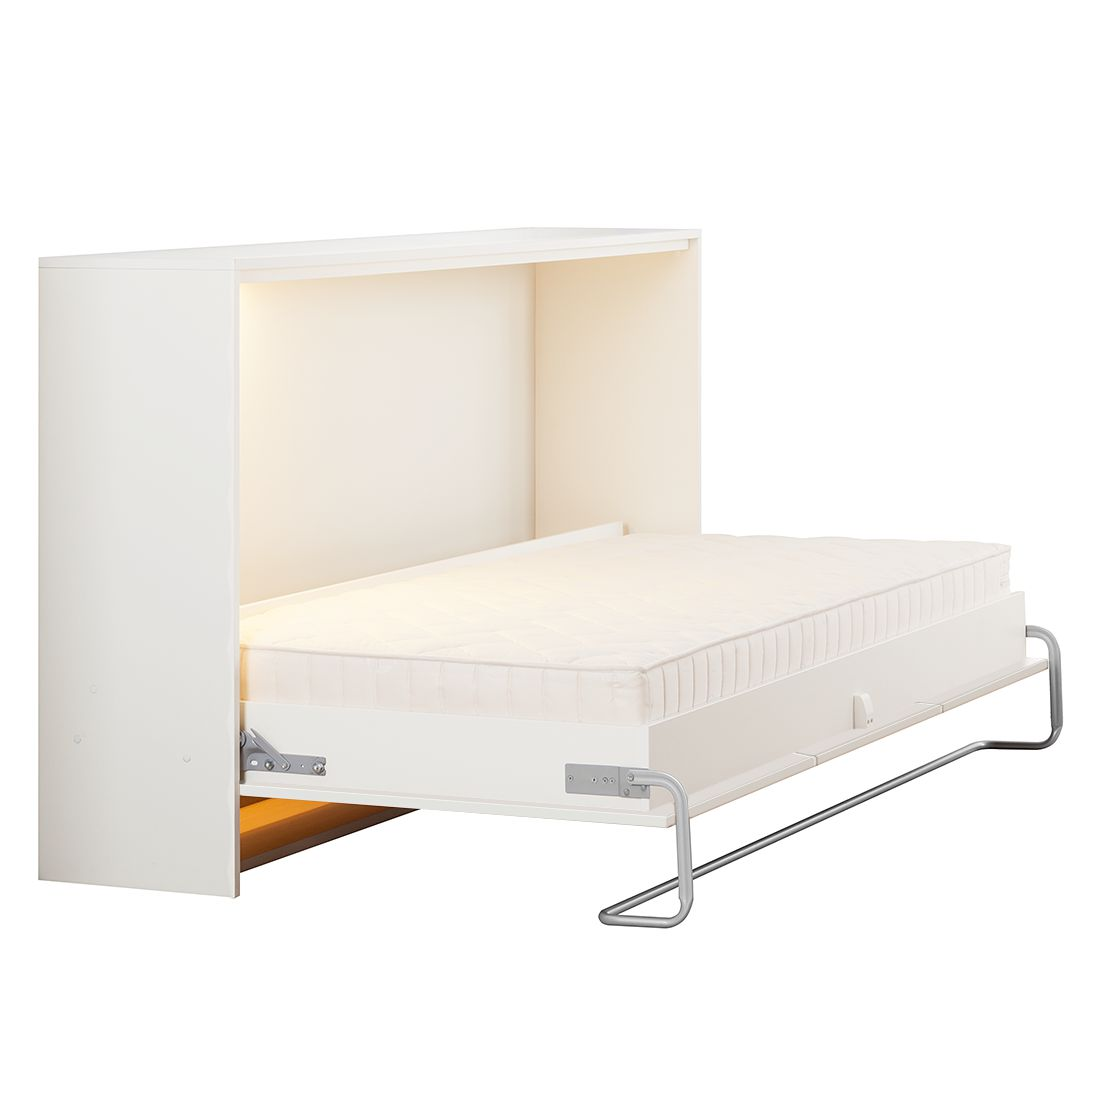 nehl schrankbett kombination alle ideen ber home design. Black Bedroom Furniture Sets. Home Design Ideas